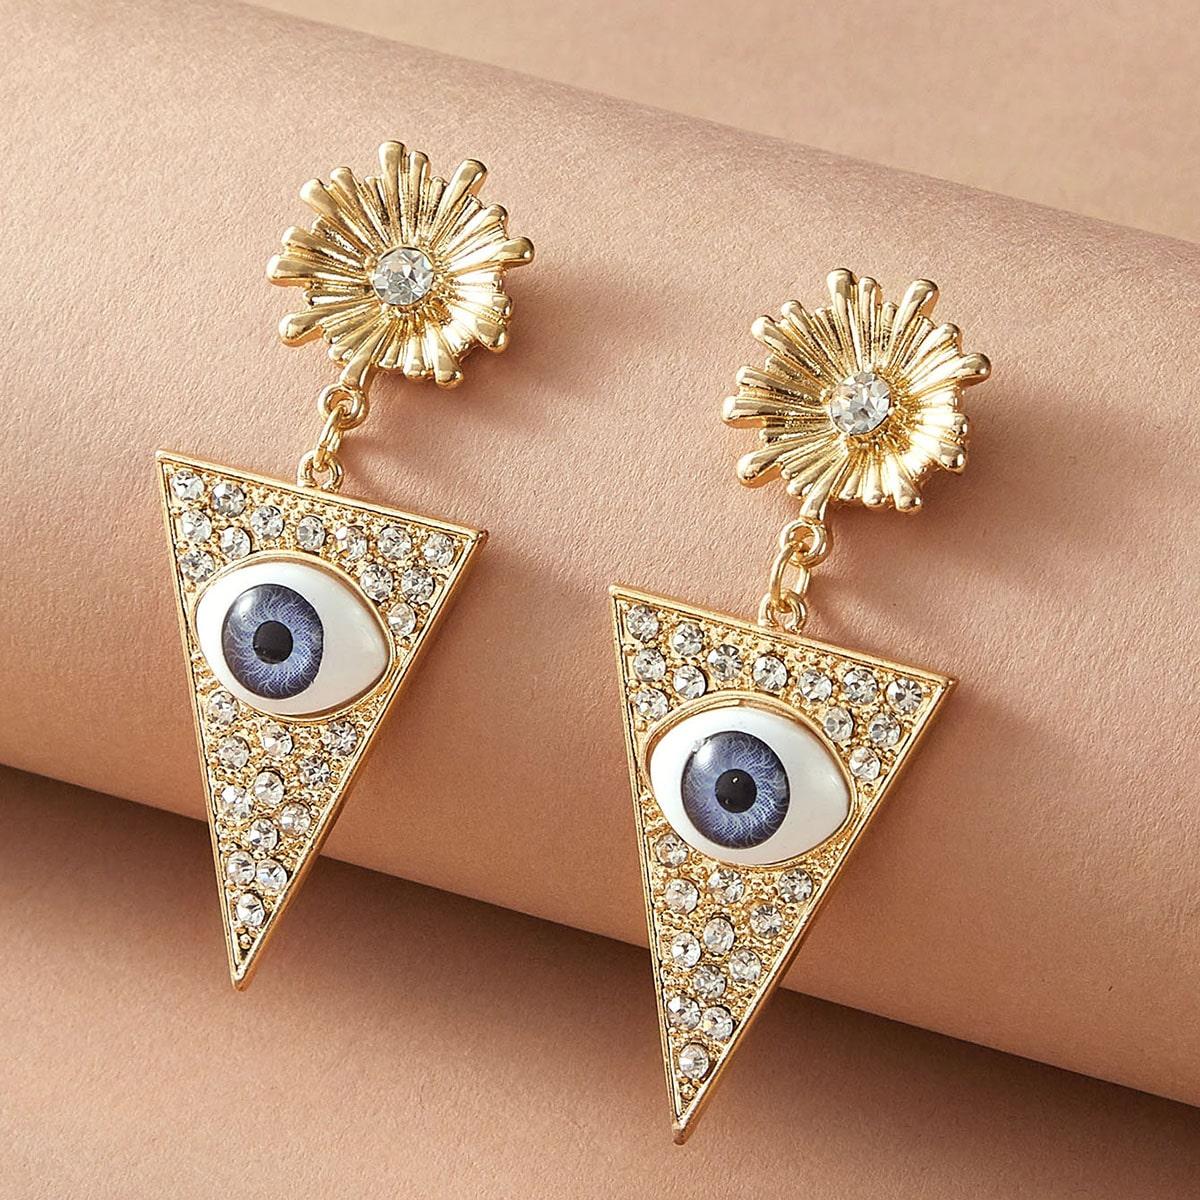 1 Paar Strass Gravur Eye & Triangle Decor Drop Ohrringe